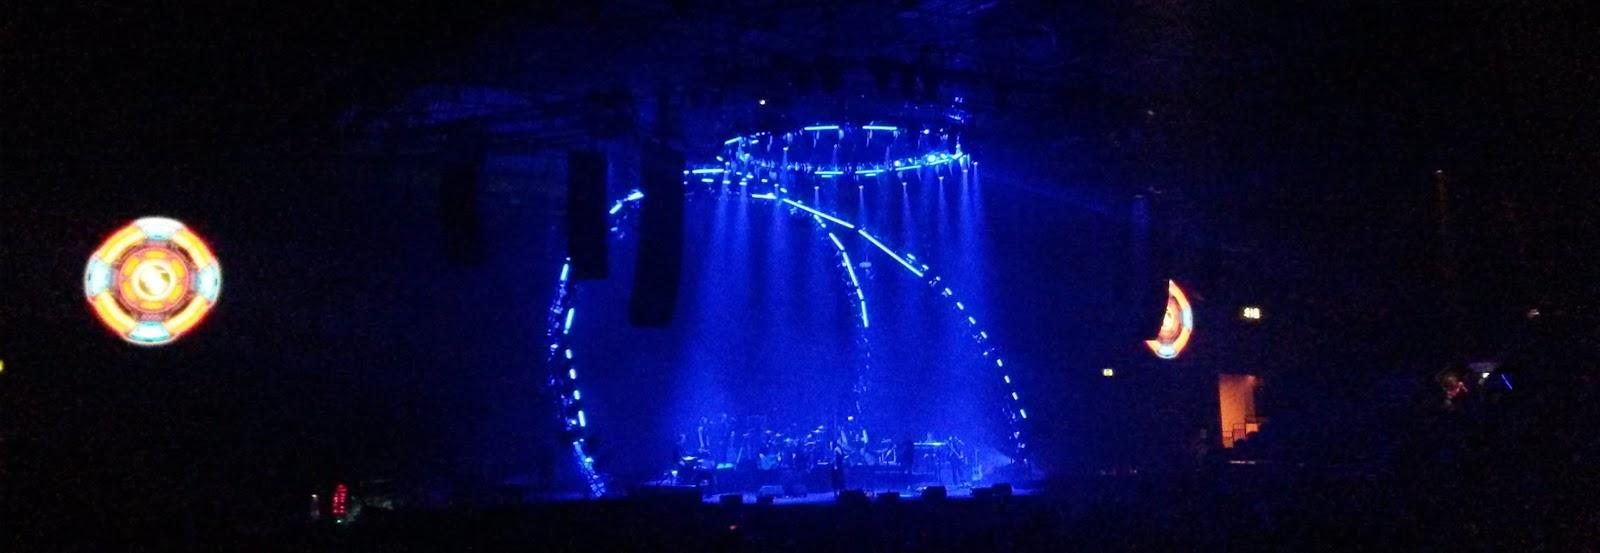 elobeatlesforever: Caught Live [2]: Jeff Lynne's ELO